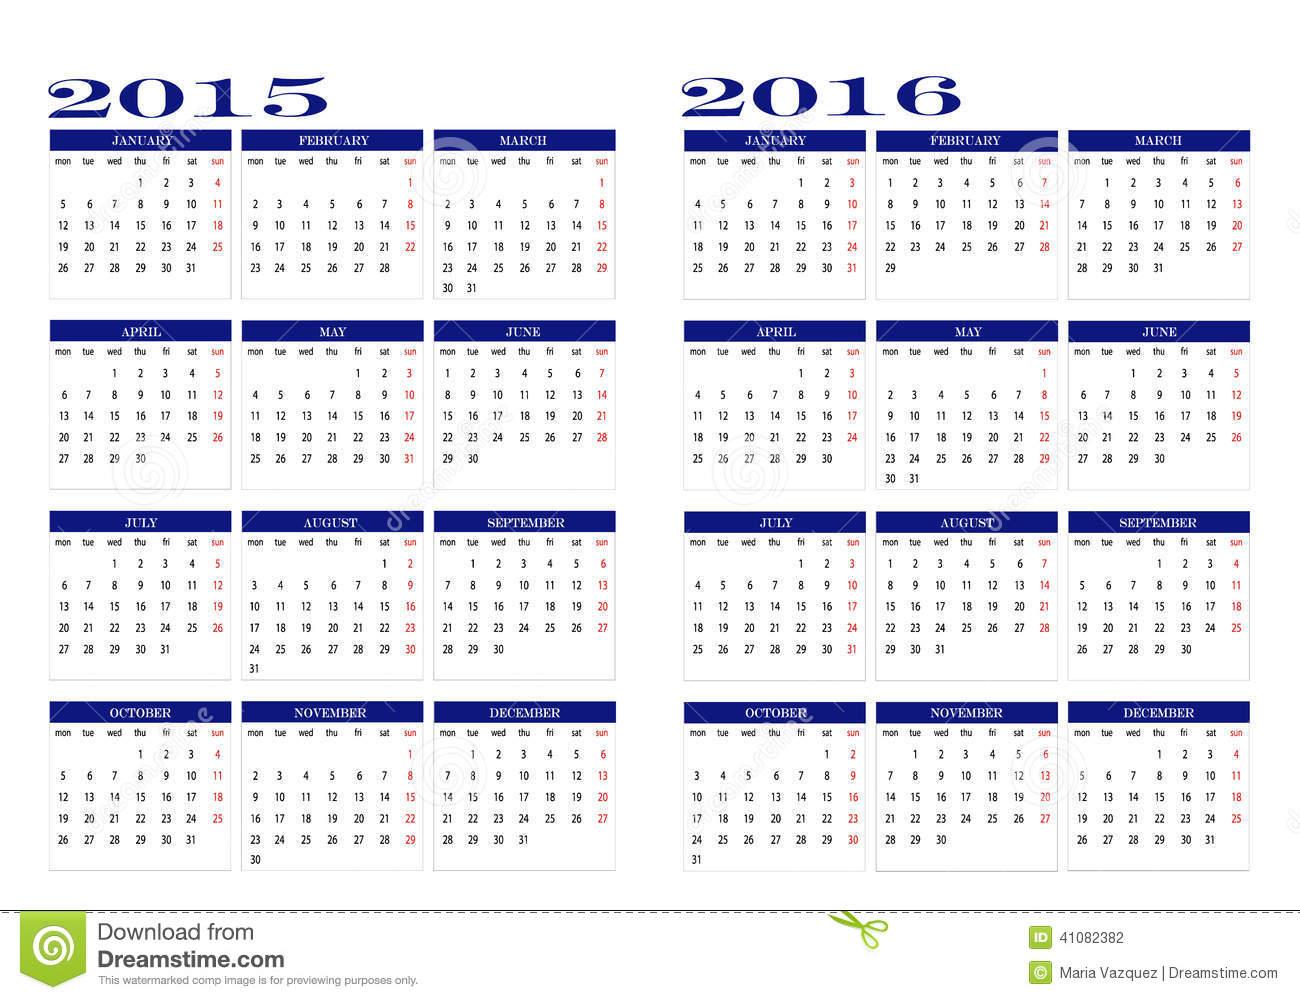 Calendar 2015 And 2016 Stock Vector. Illustration Of Colors Regarding Doe School Calnder 2015 2020